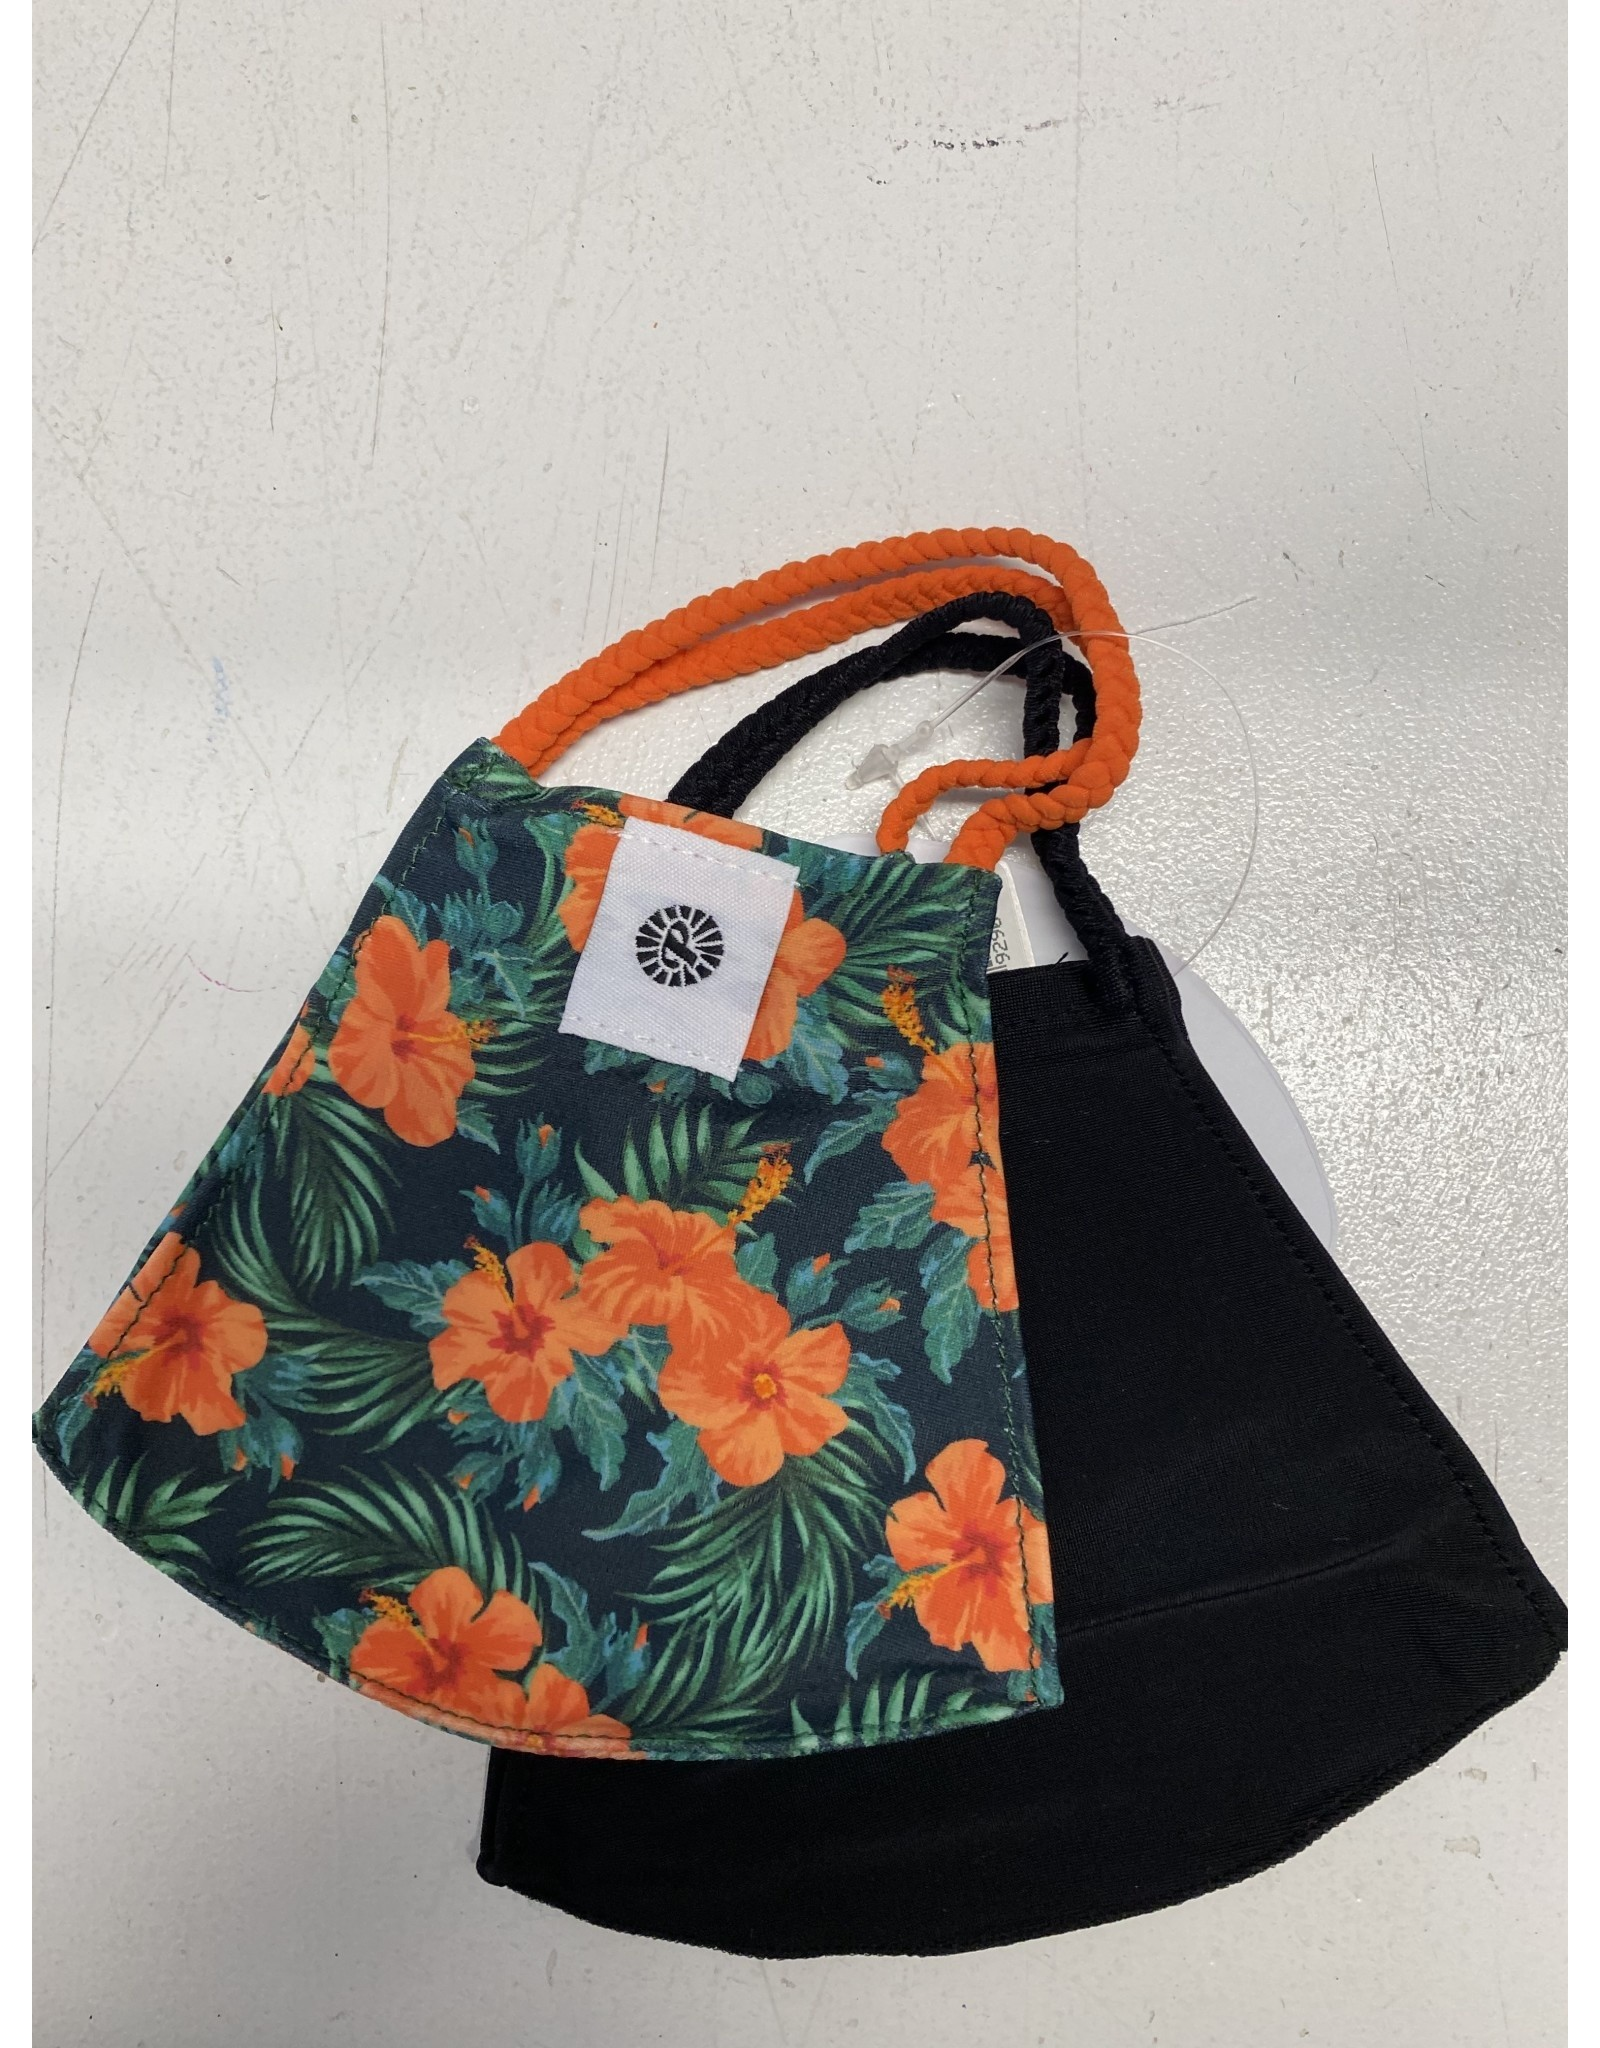 Pomchies Mask - Hibiscus Flower/Black